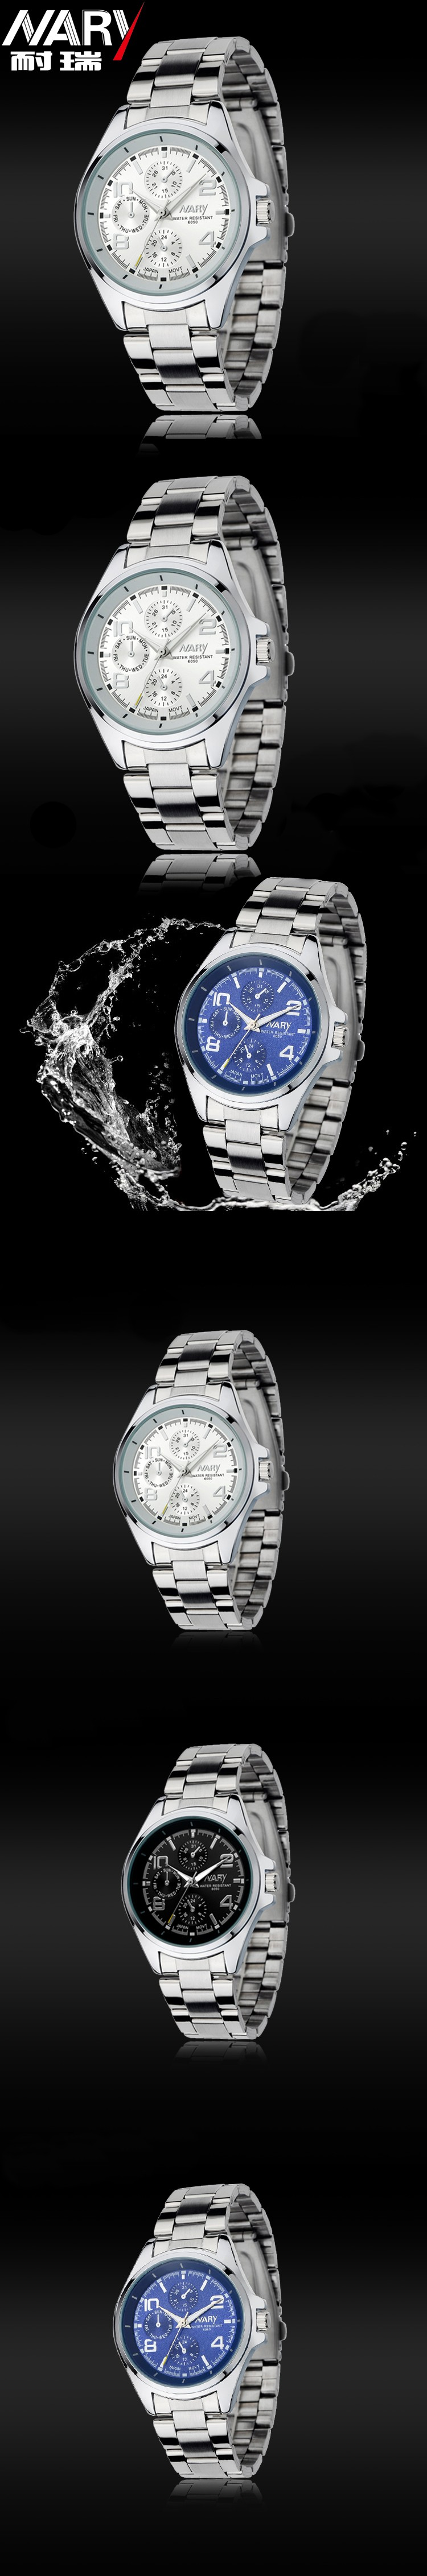 HTB1EWl7JFXXXXaYXpXXq6xXFXXX1 - Nary Часы мужчины люксовый бренд Бизнес часы кварцевые часы спортивные мужчины полный стали наручные часы Повседневное часы Relogio Masculino 2016